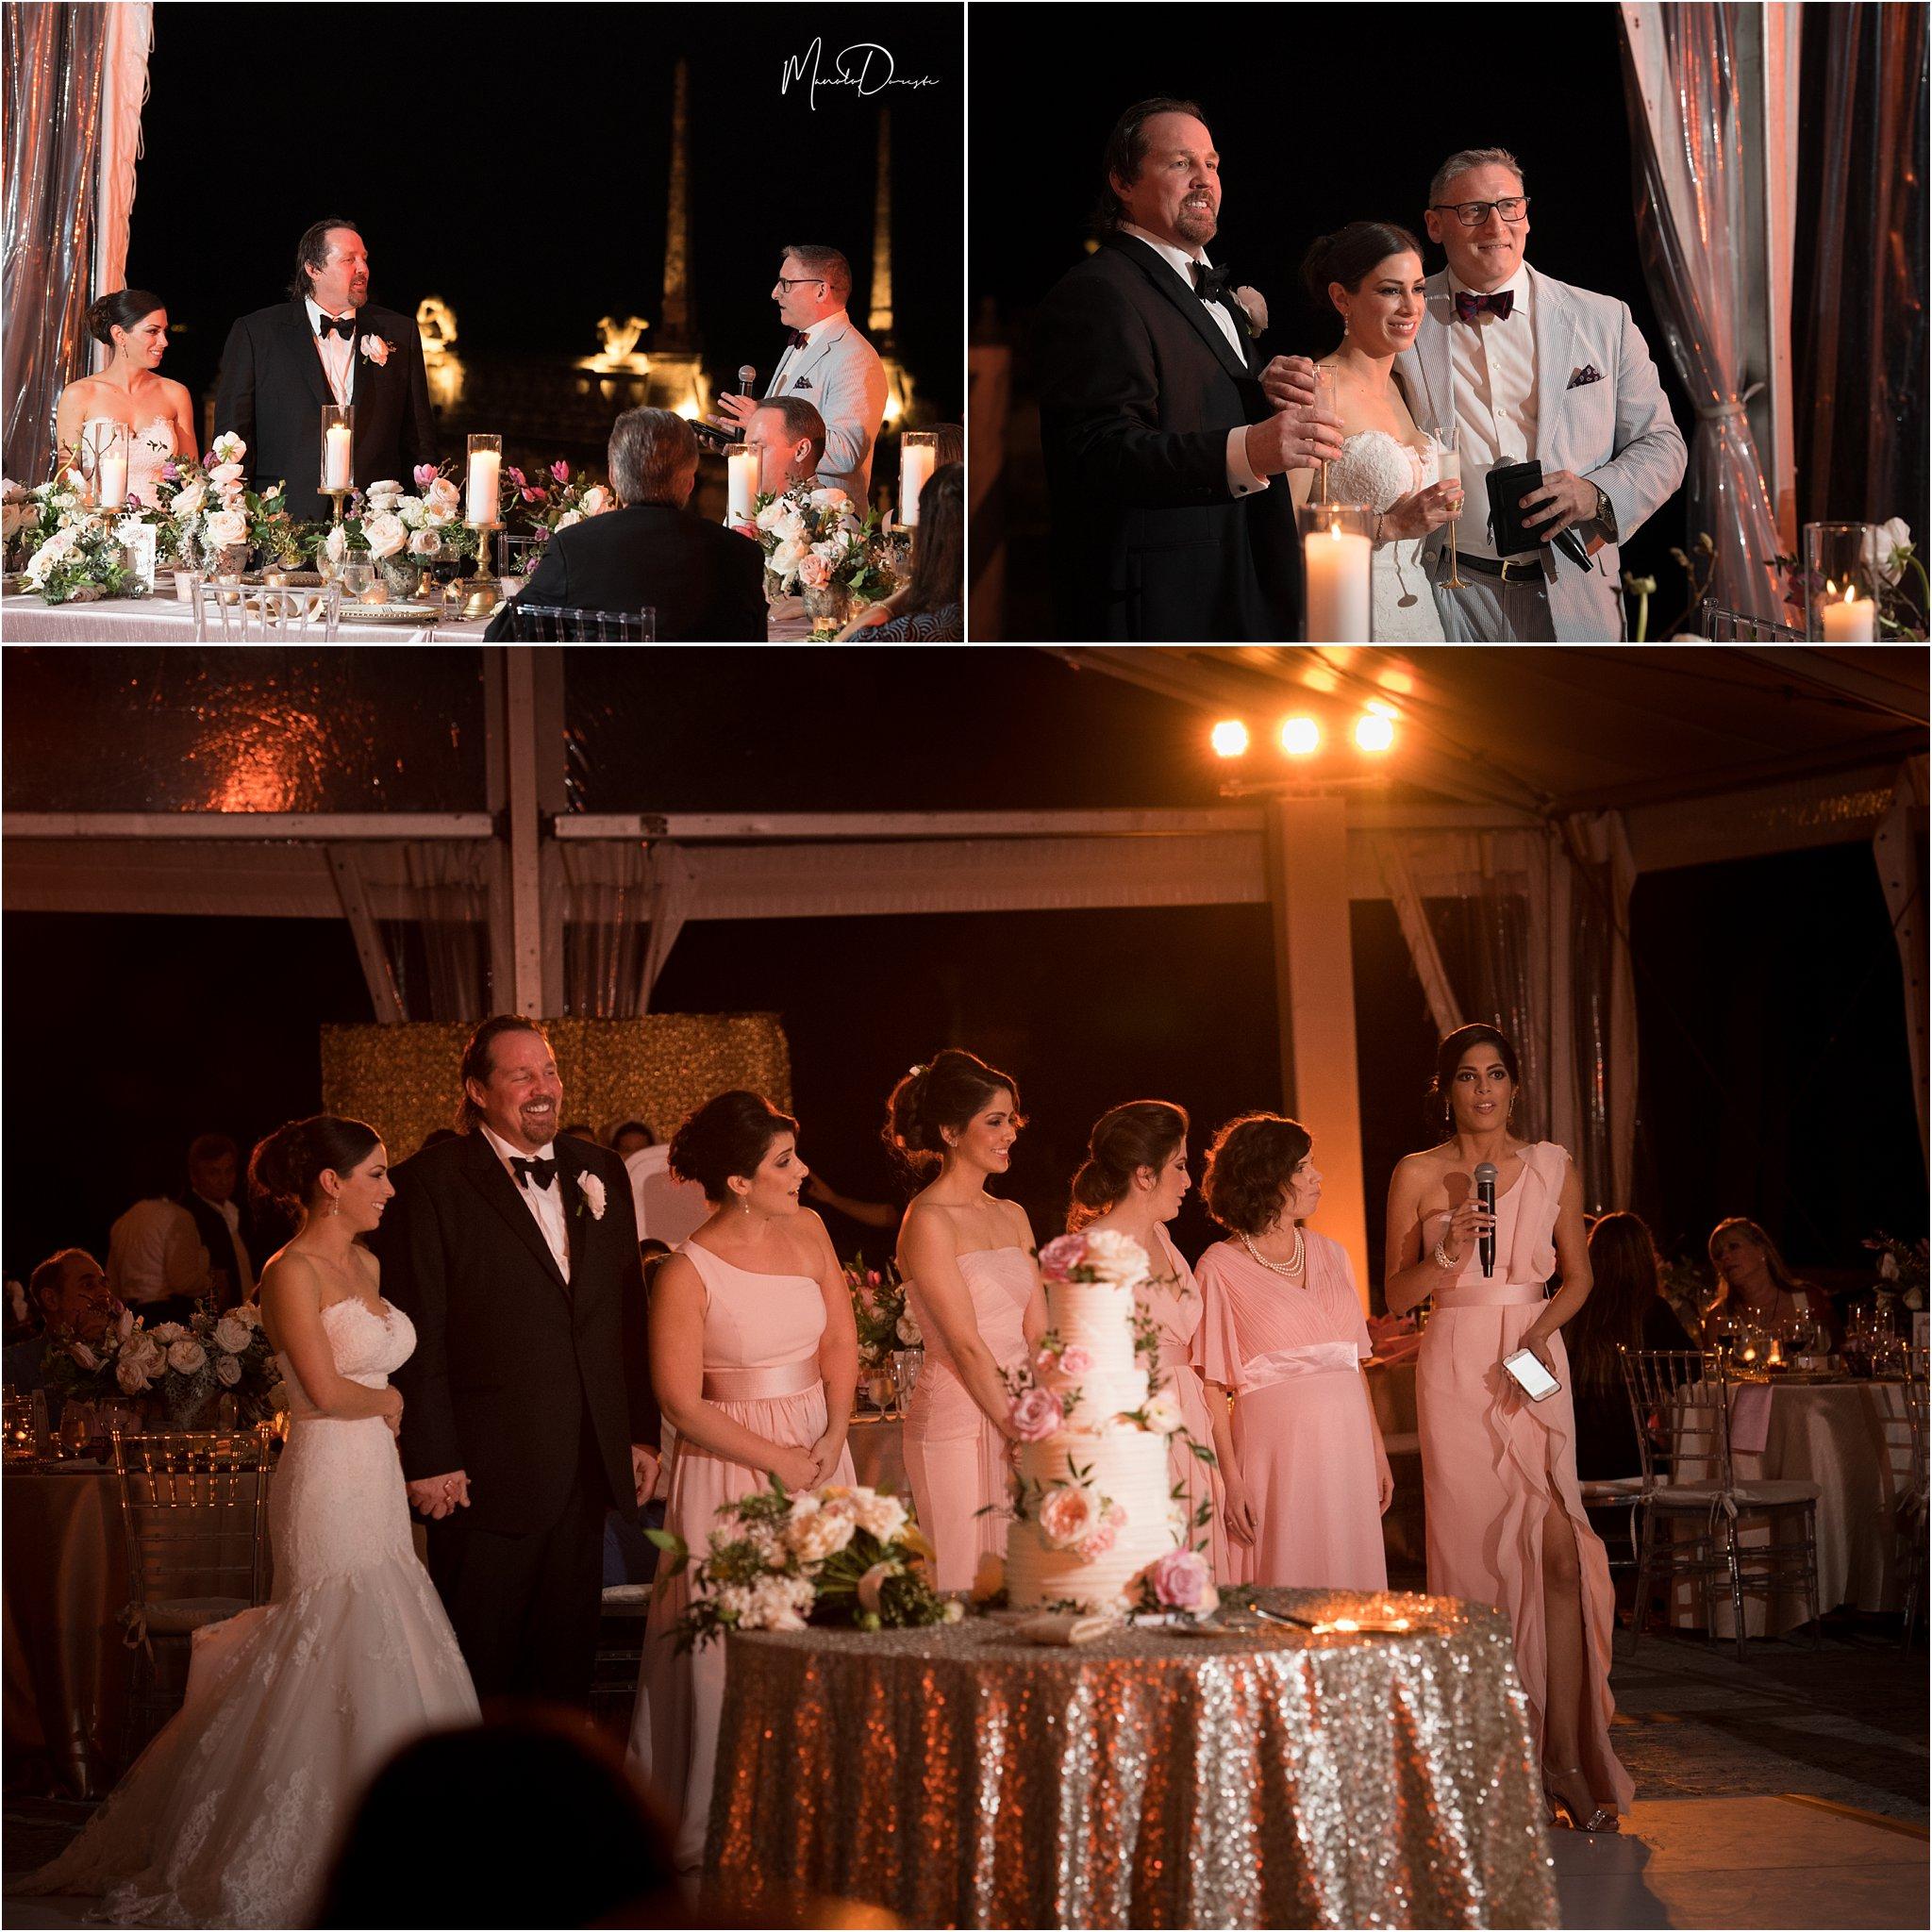 00762_ManoloDoreste_InFocusStudios_Wedding_Family_Photography_Miami_MiamiPhotographer.jpg